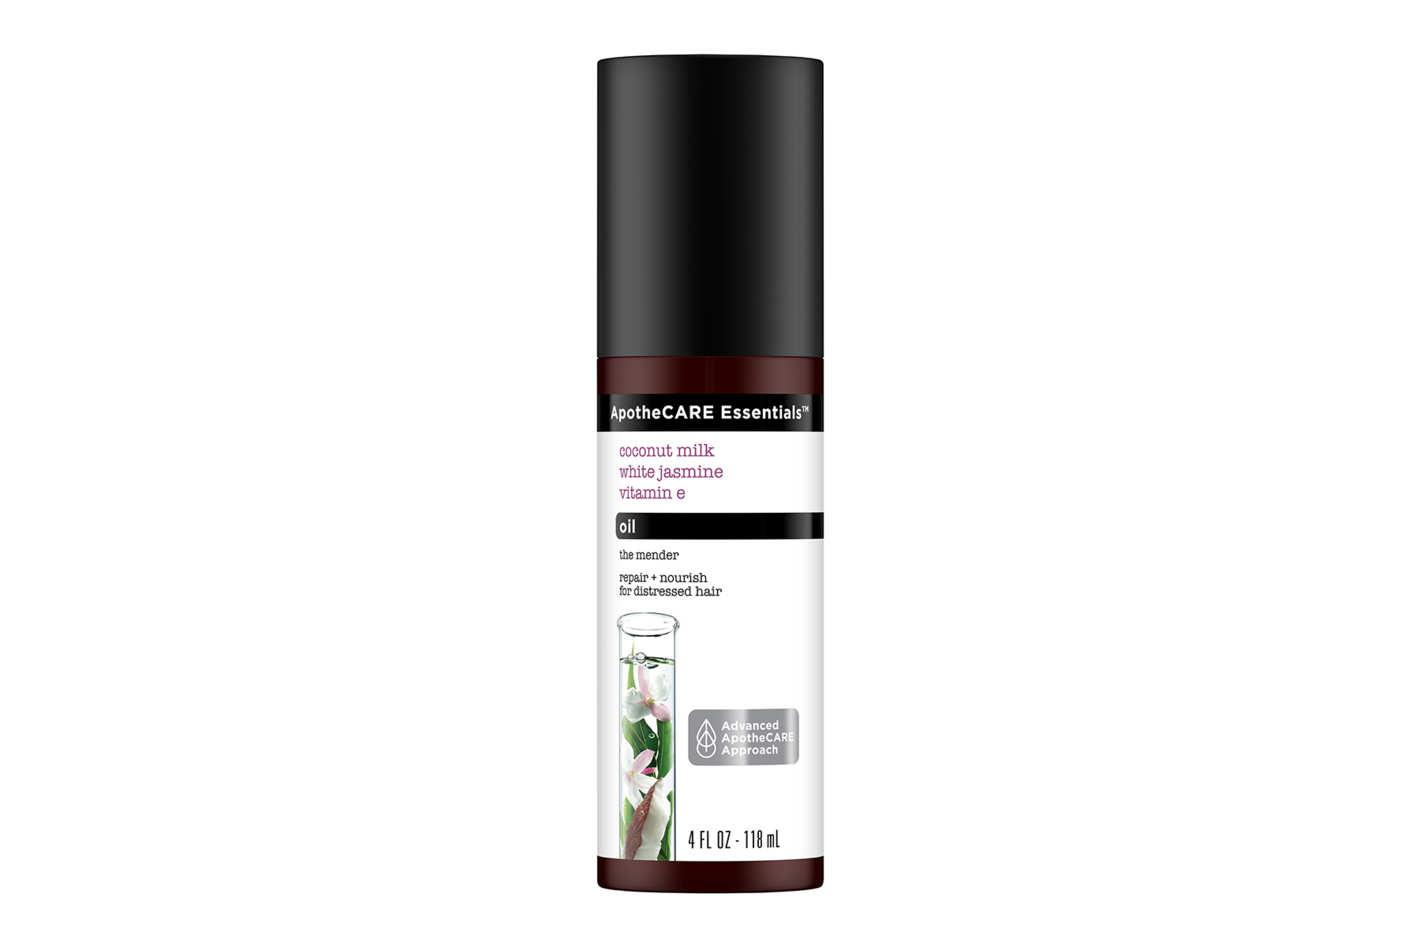 ApotheCARE Essentials The Mender Coconut Milk White Jasmine Vitamin E Hair Oil